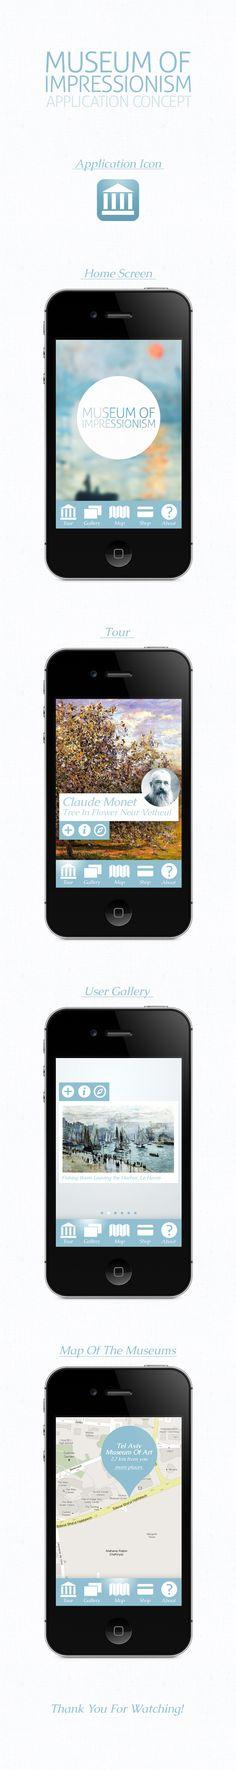 Museum Of Impressionism App Concept - by Denis Korytchenko